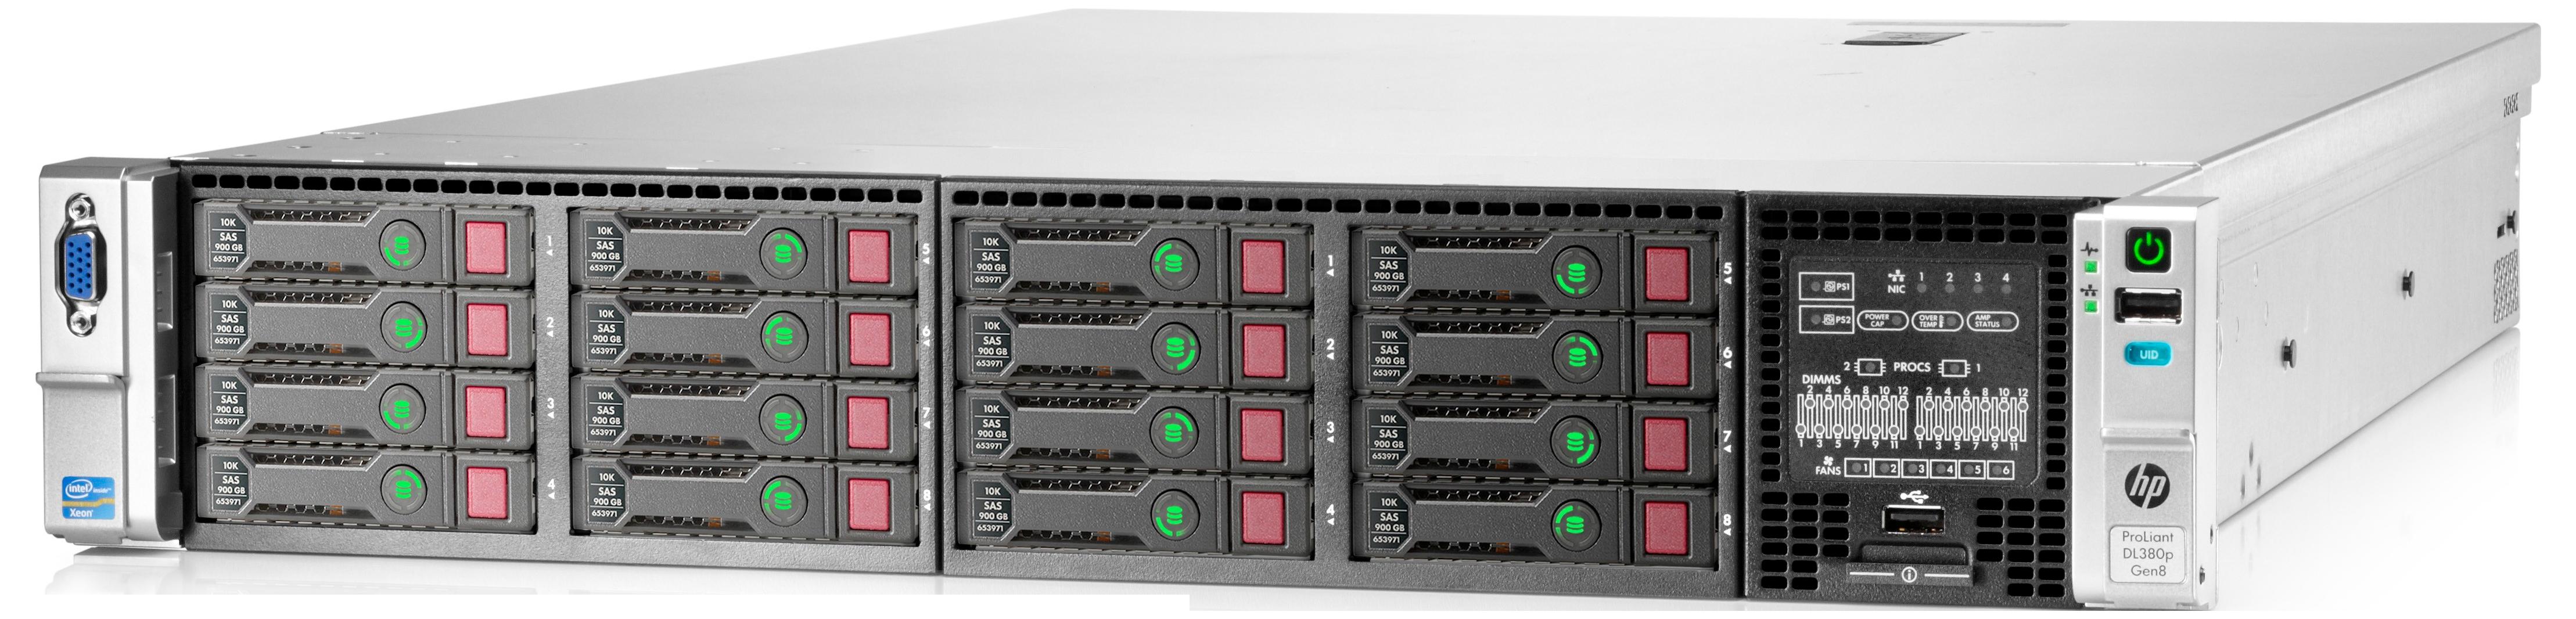 Desktop Dell Optiplex 3060 (MFF)